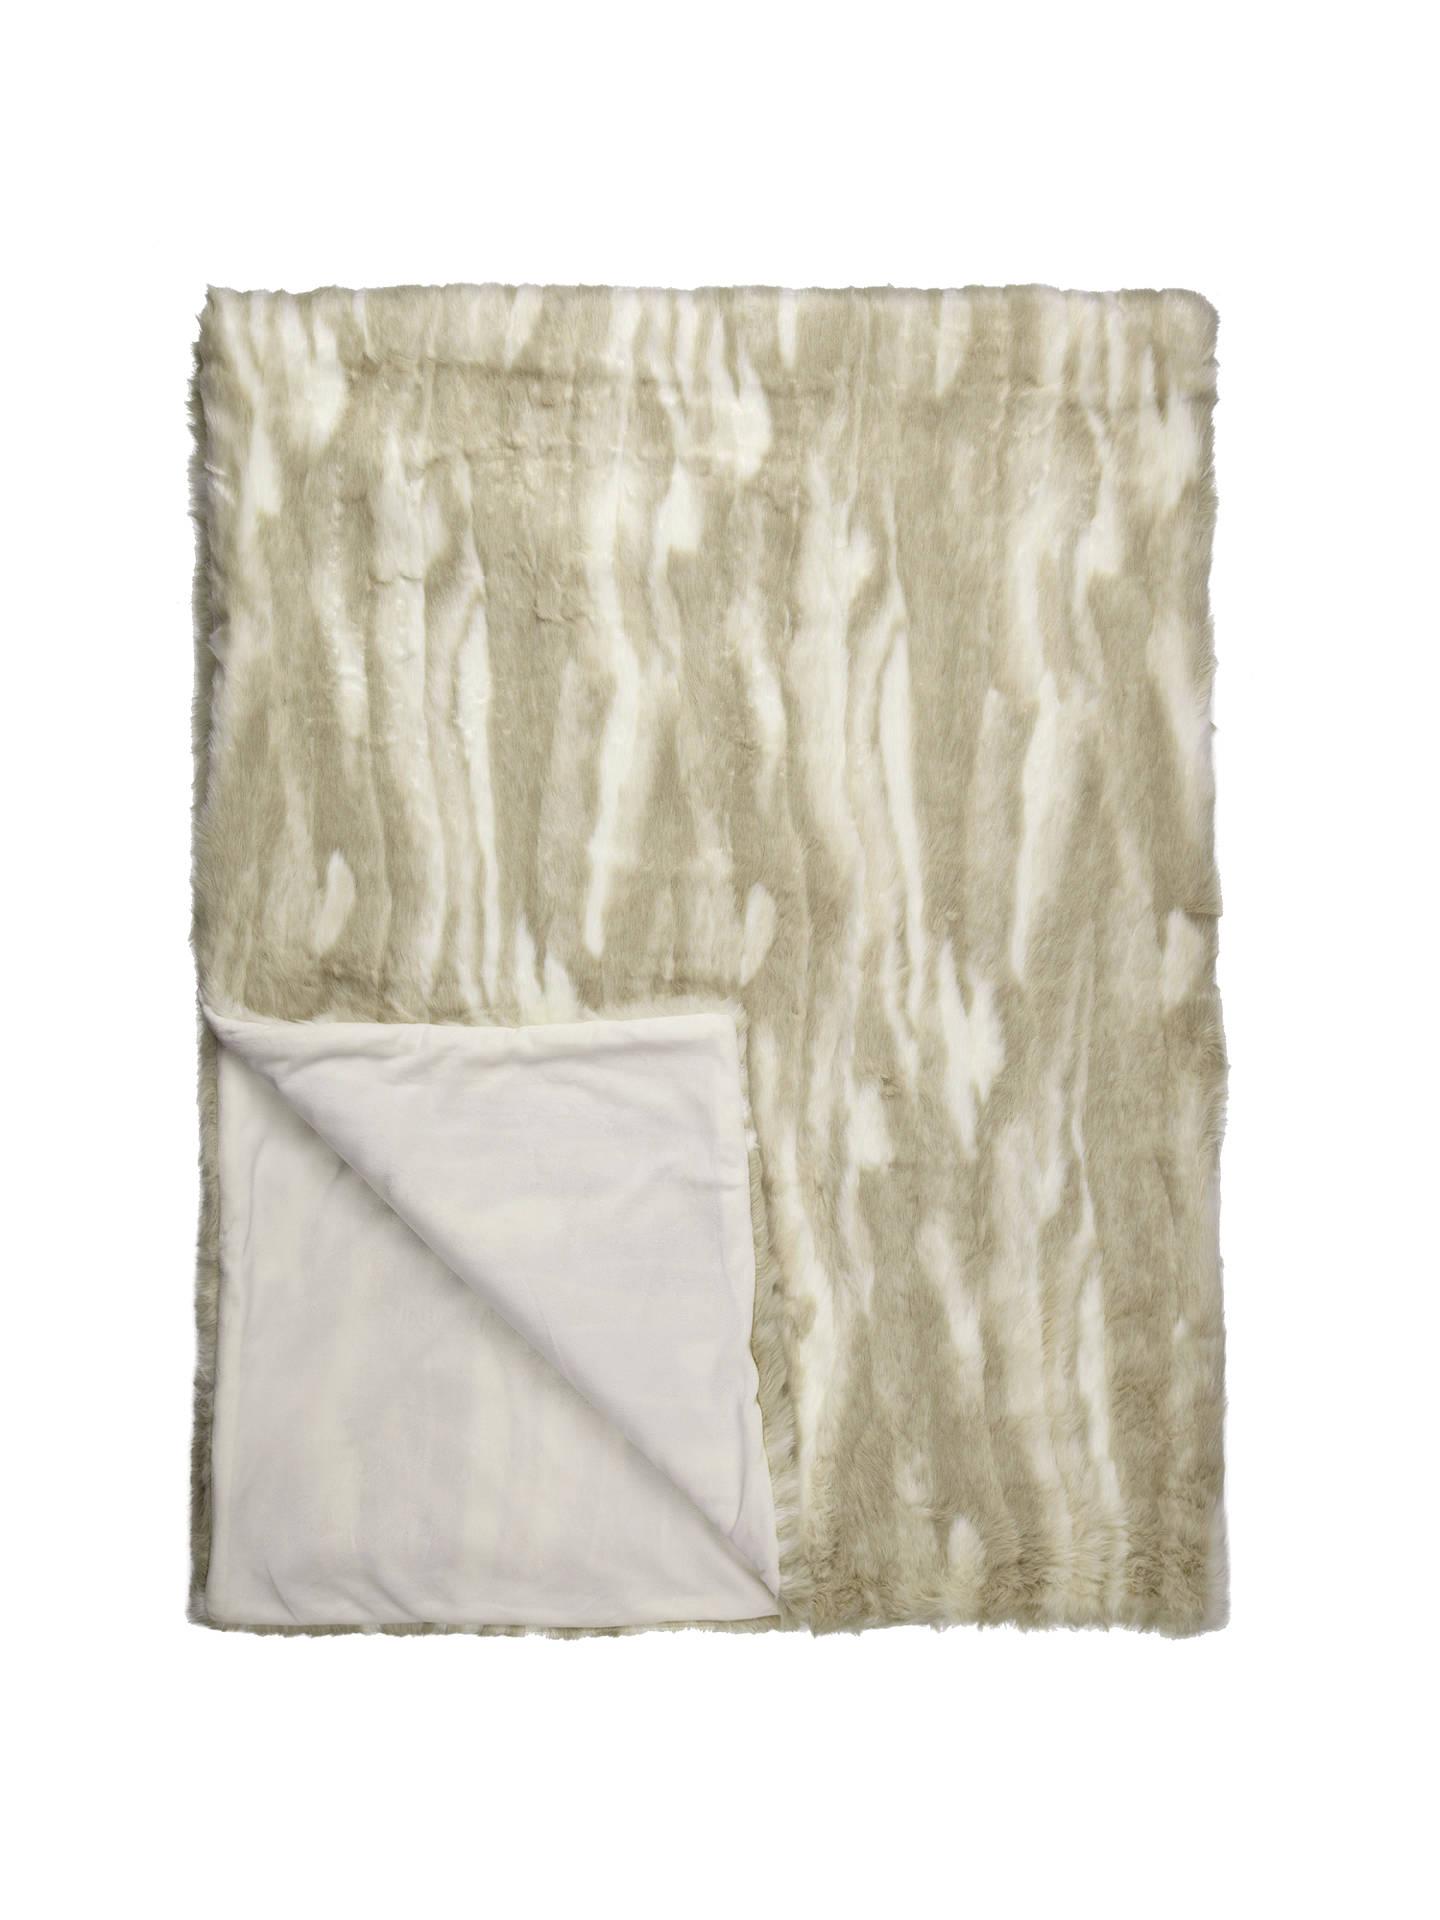 john lewis svetlana faux fur throw at john lewis partners. Black Bedroom Furniture Sets. Home Design Ideas